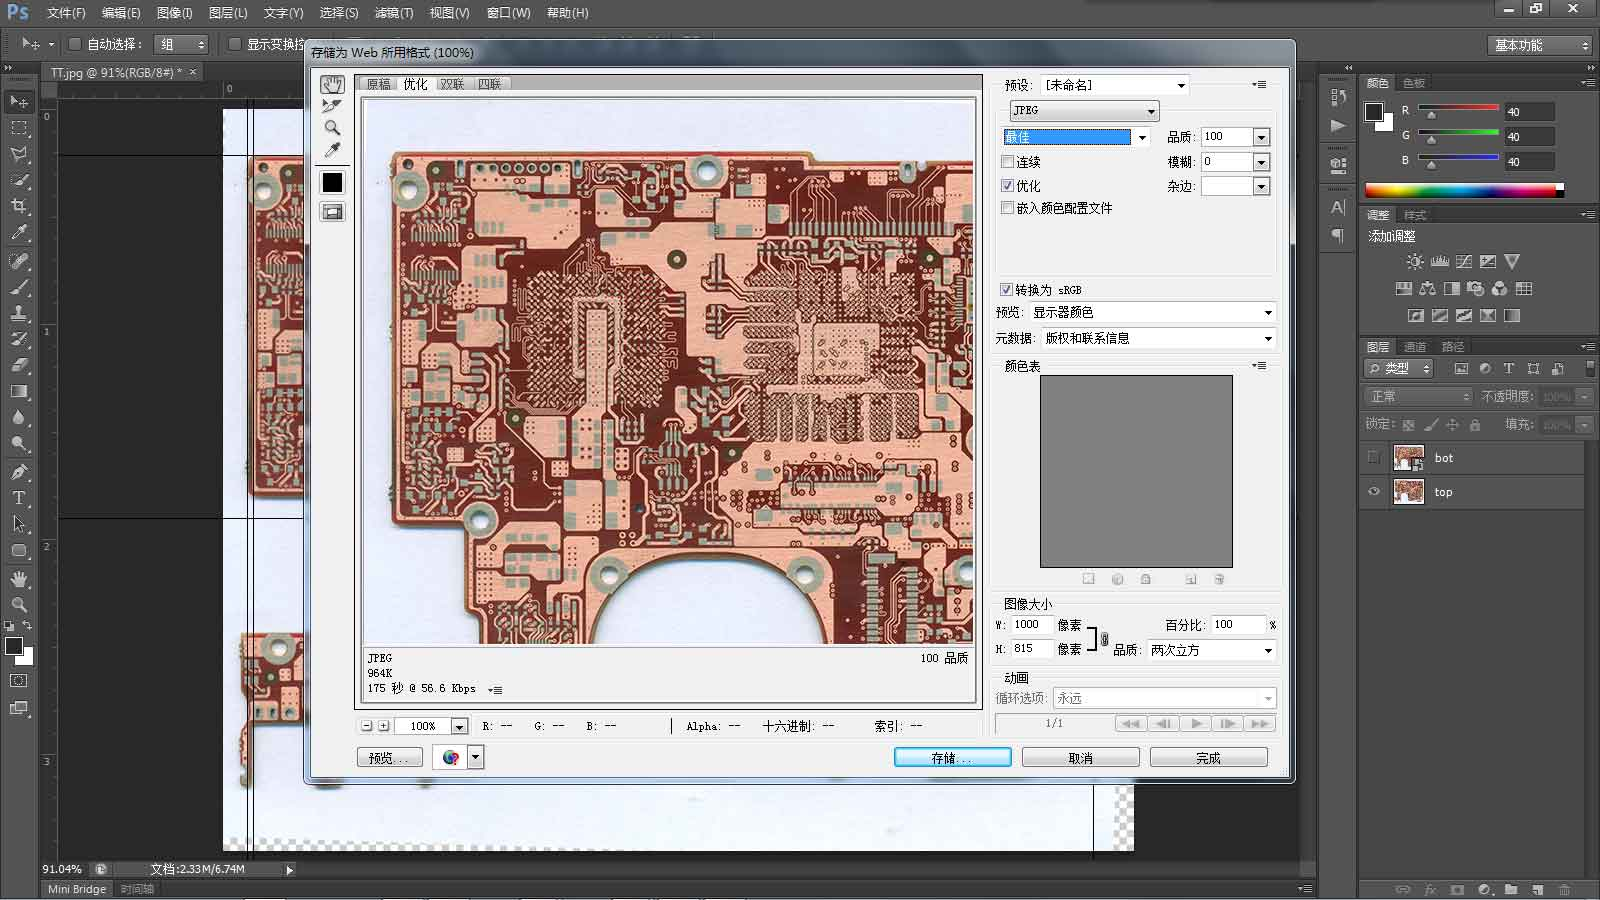 PCB抄板图片处理步骤图解10